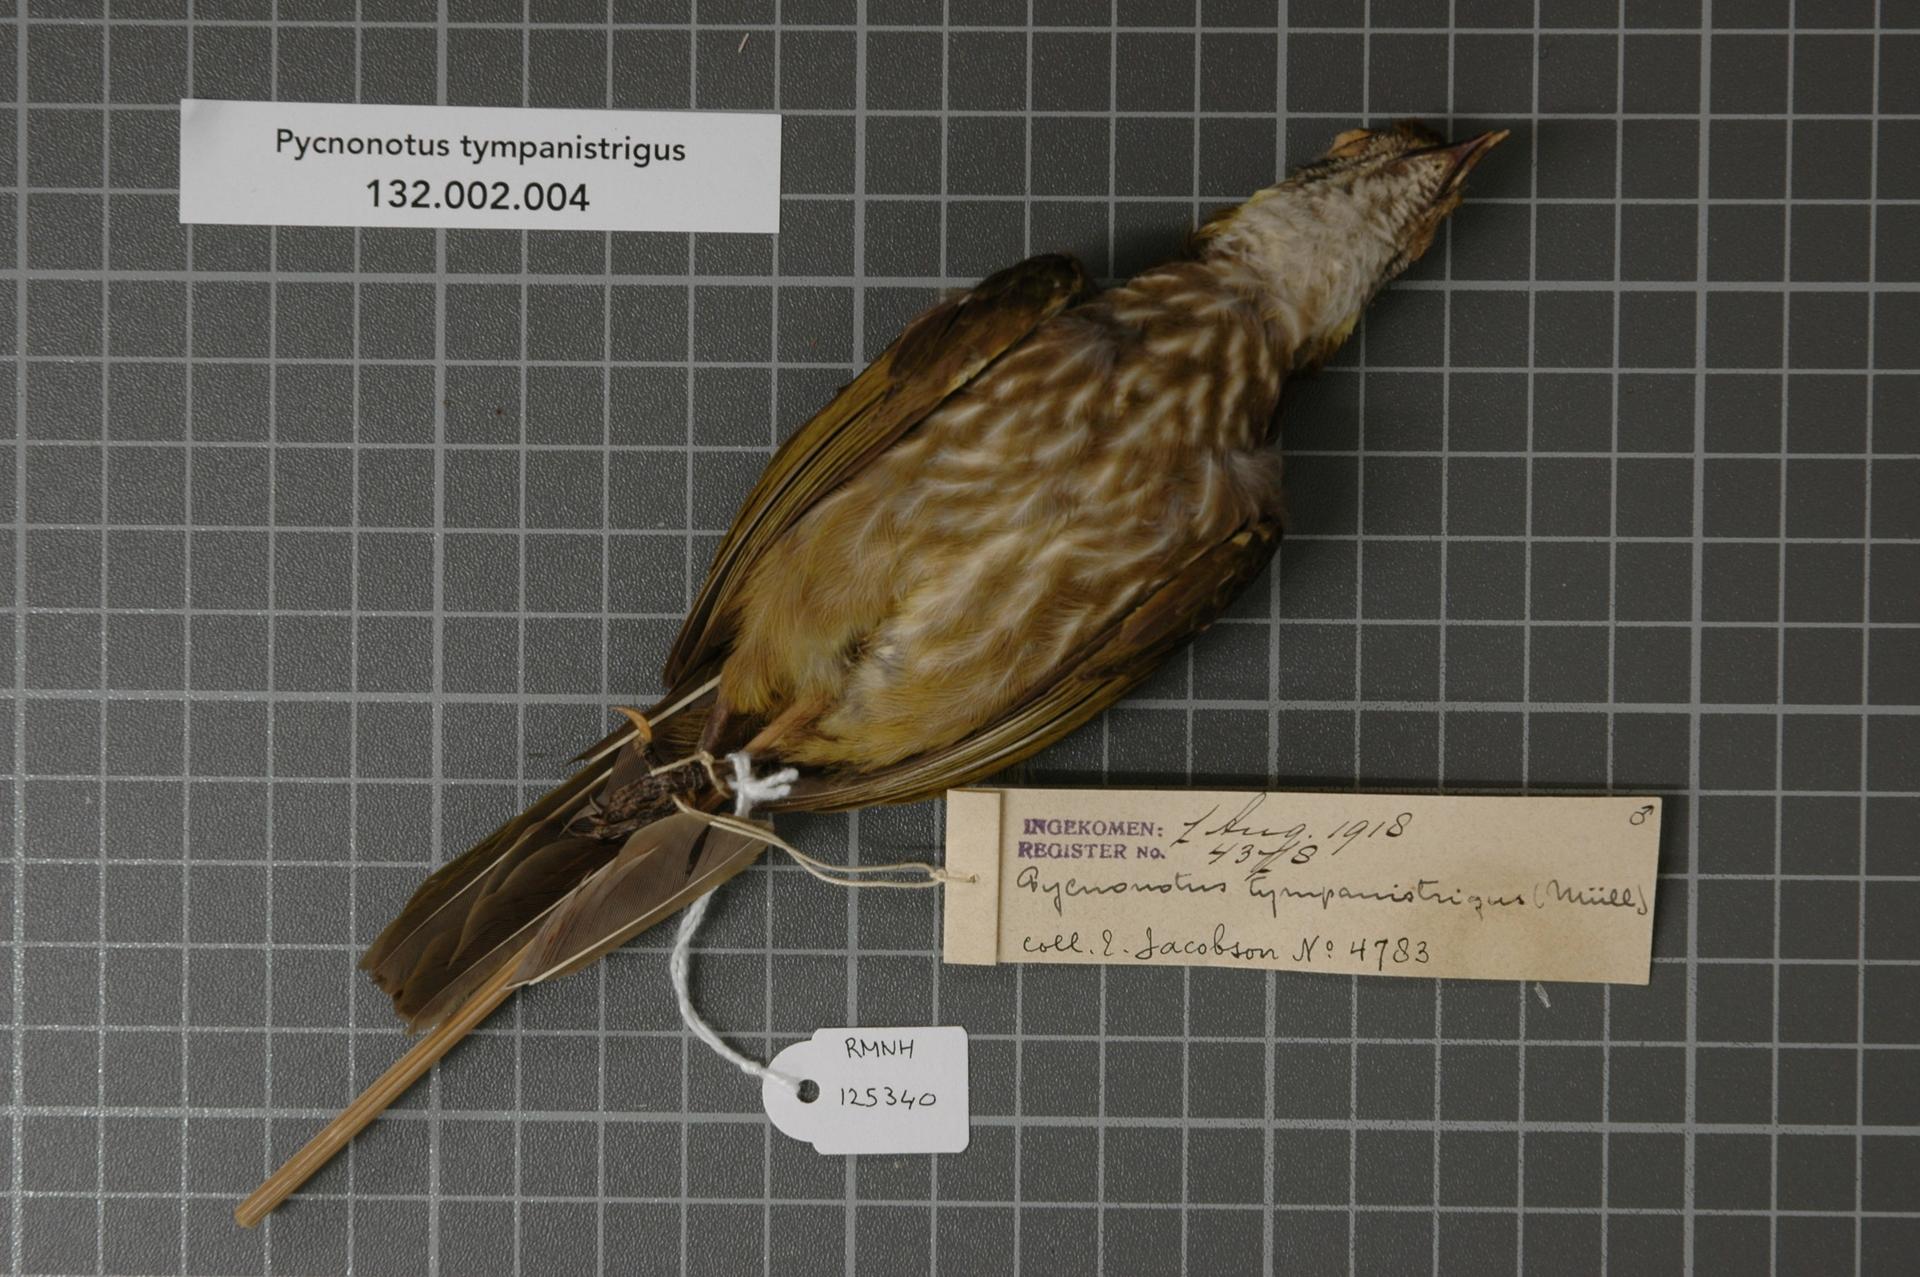 RMNH.AVES.125340 | Pycnonotus tympanistrigus (S. Muller, 1835)